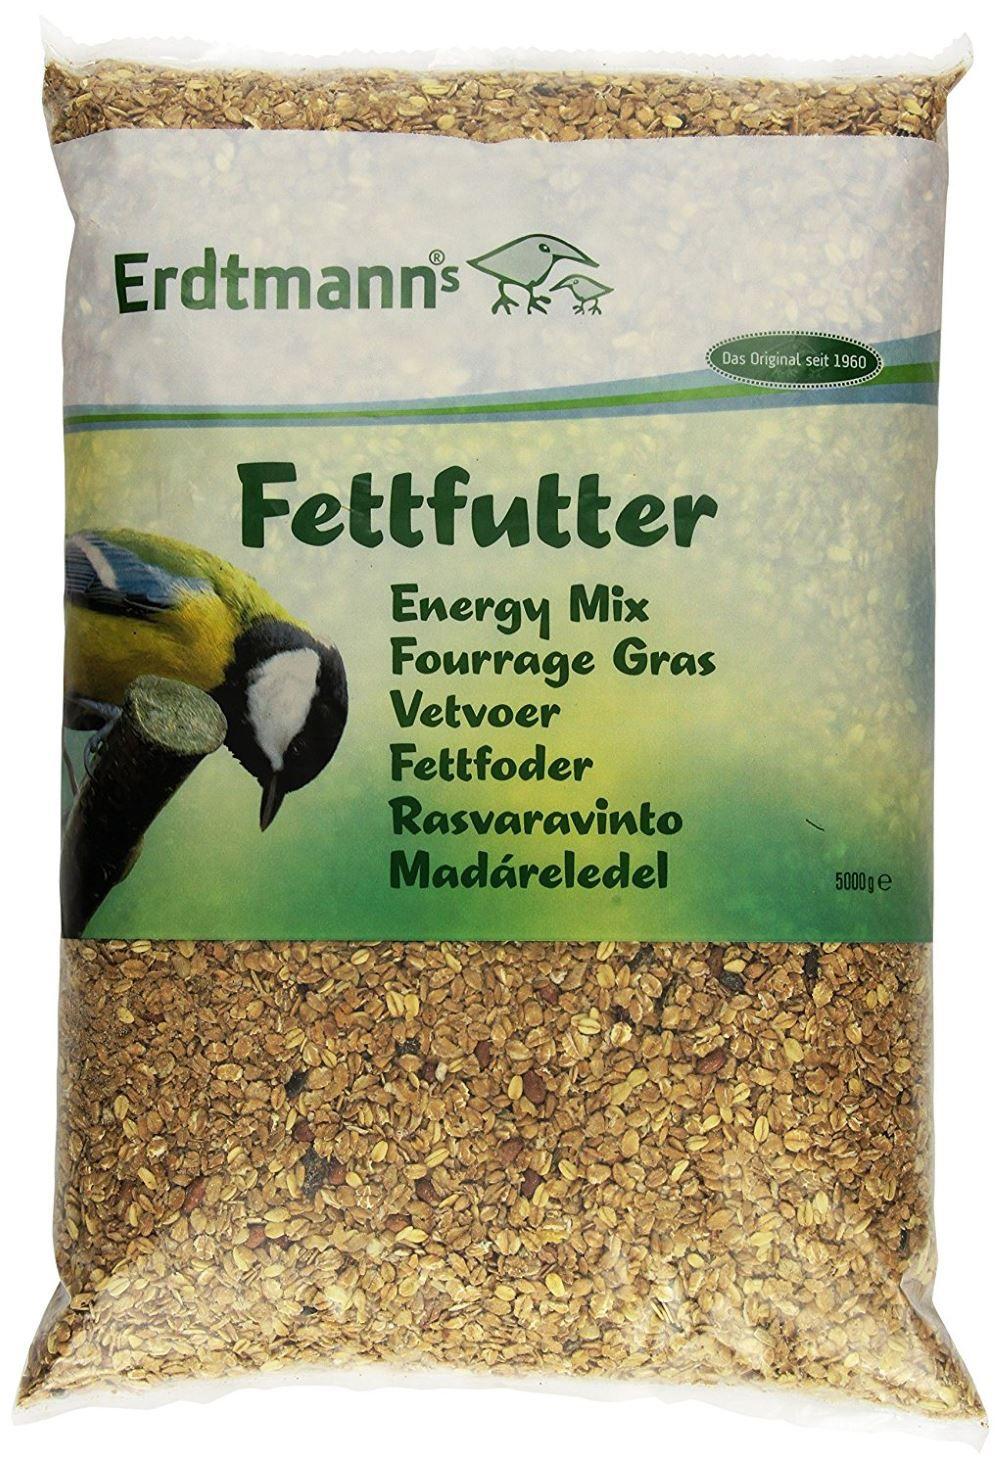 Erdtmanns Fettfutter 5kg Vögel füttern im Winter – Das günstigste Vogelfutter